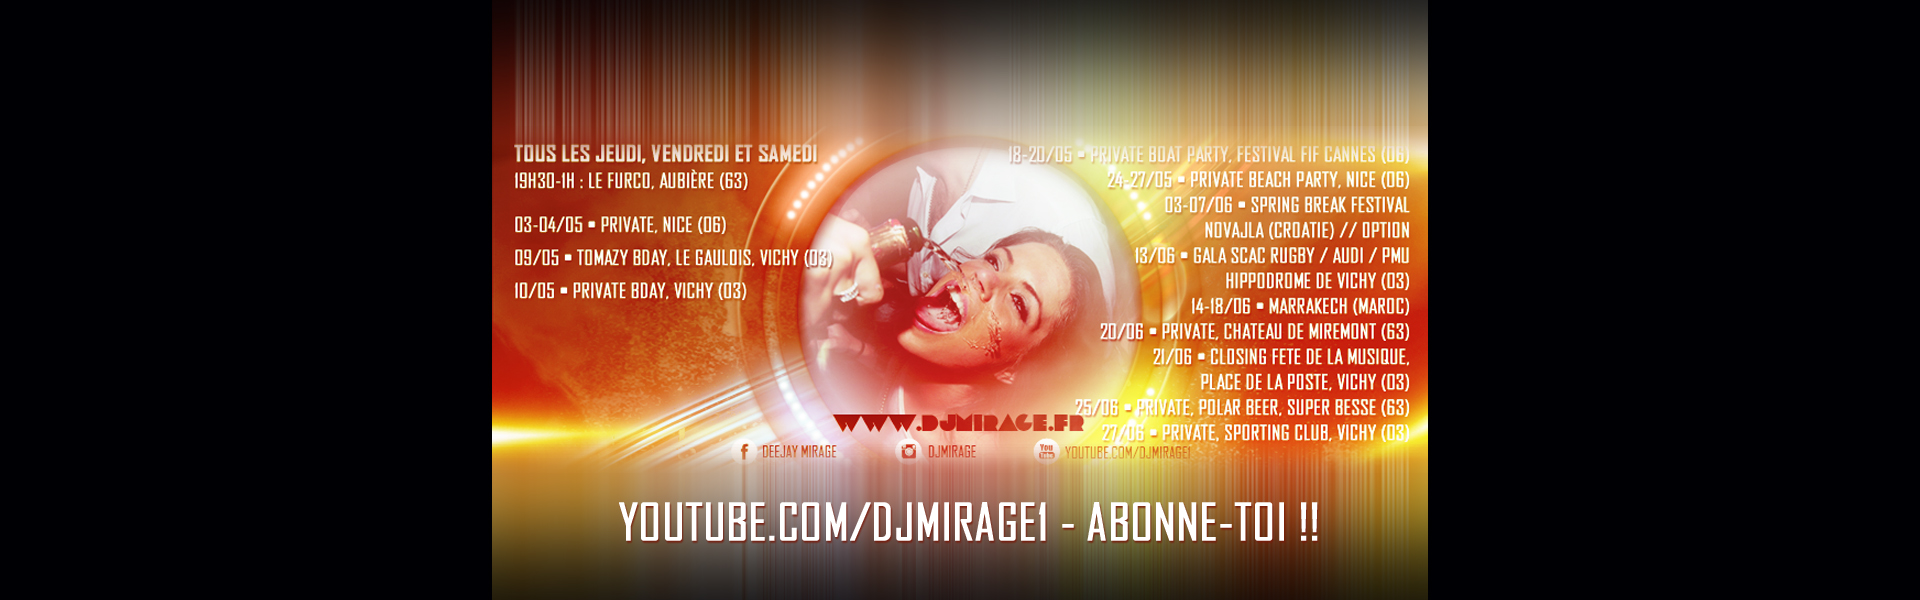 http://djmirage.fr/wp-content/uploads/2014/01/slider-accueil-deejaymirage-juin15.jpg